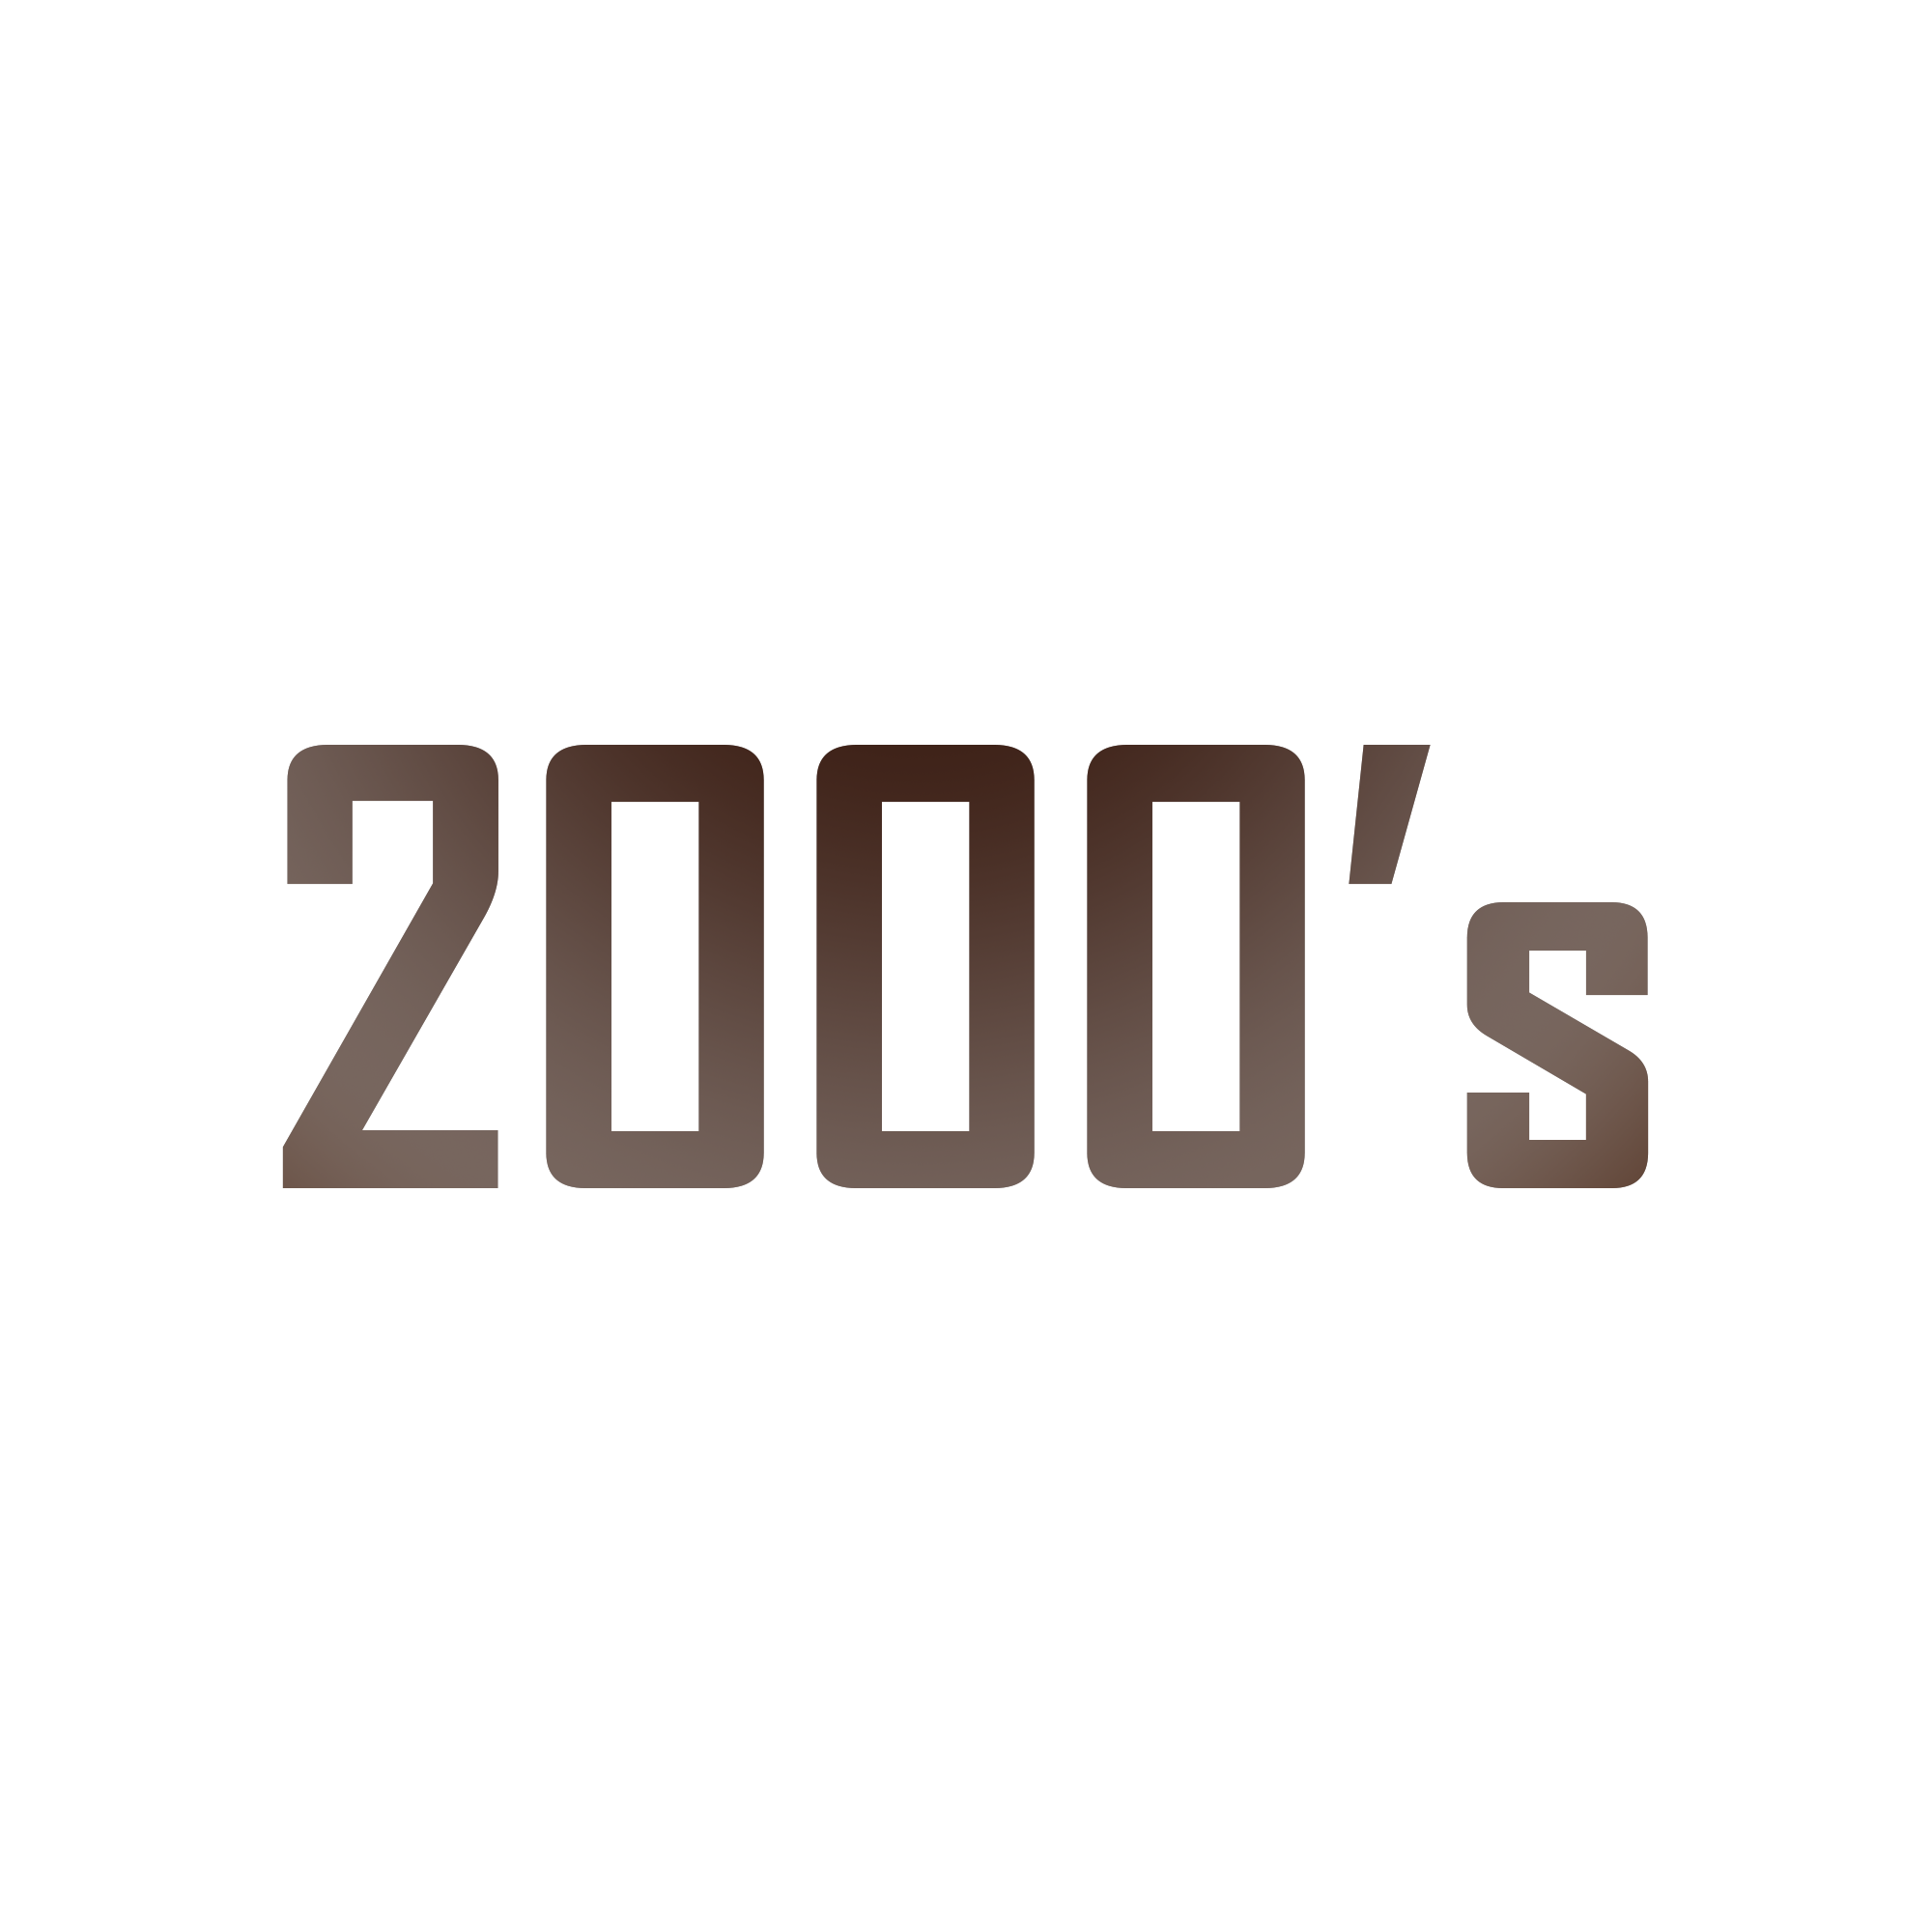 2000's (Радио нулевых)